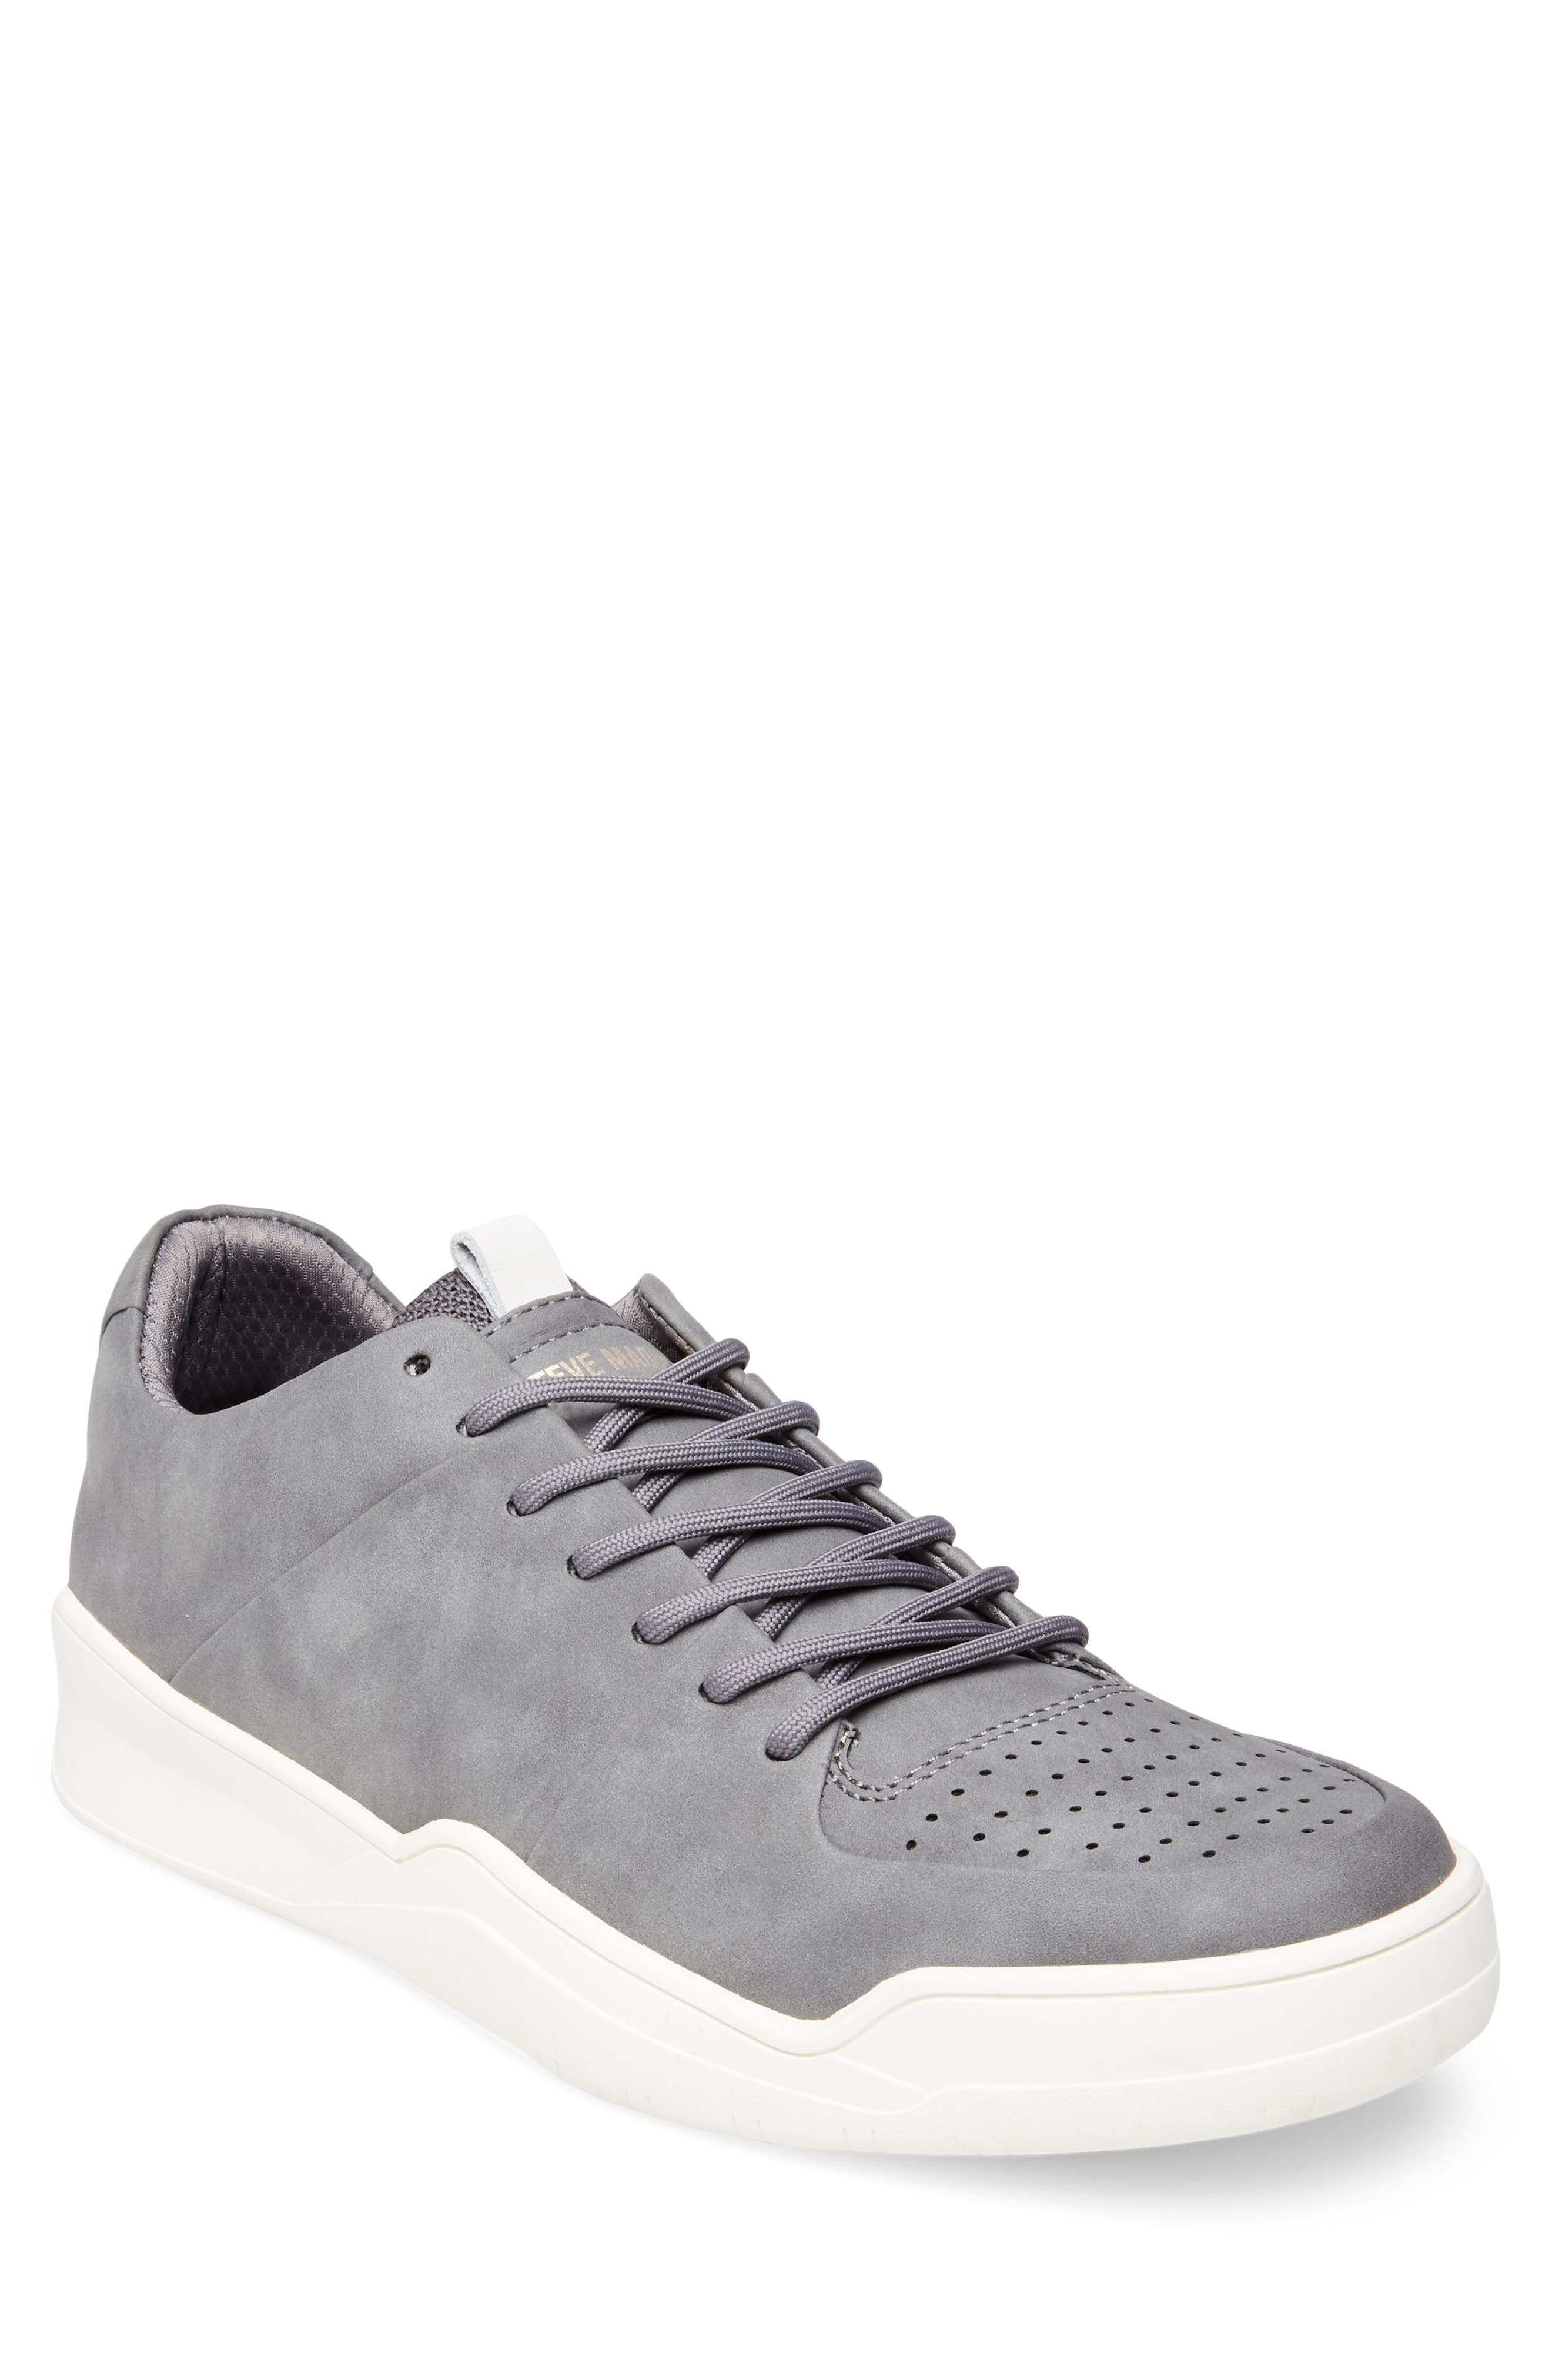 Vantage Sneaker,                             Main thumbnail 1, color,                             Grey